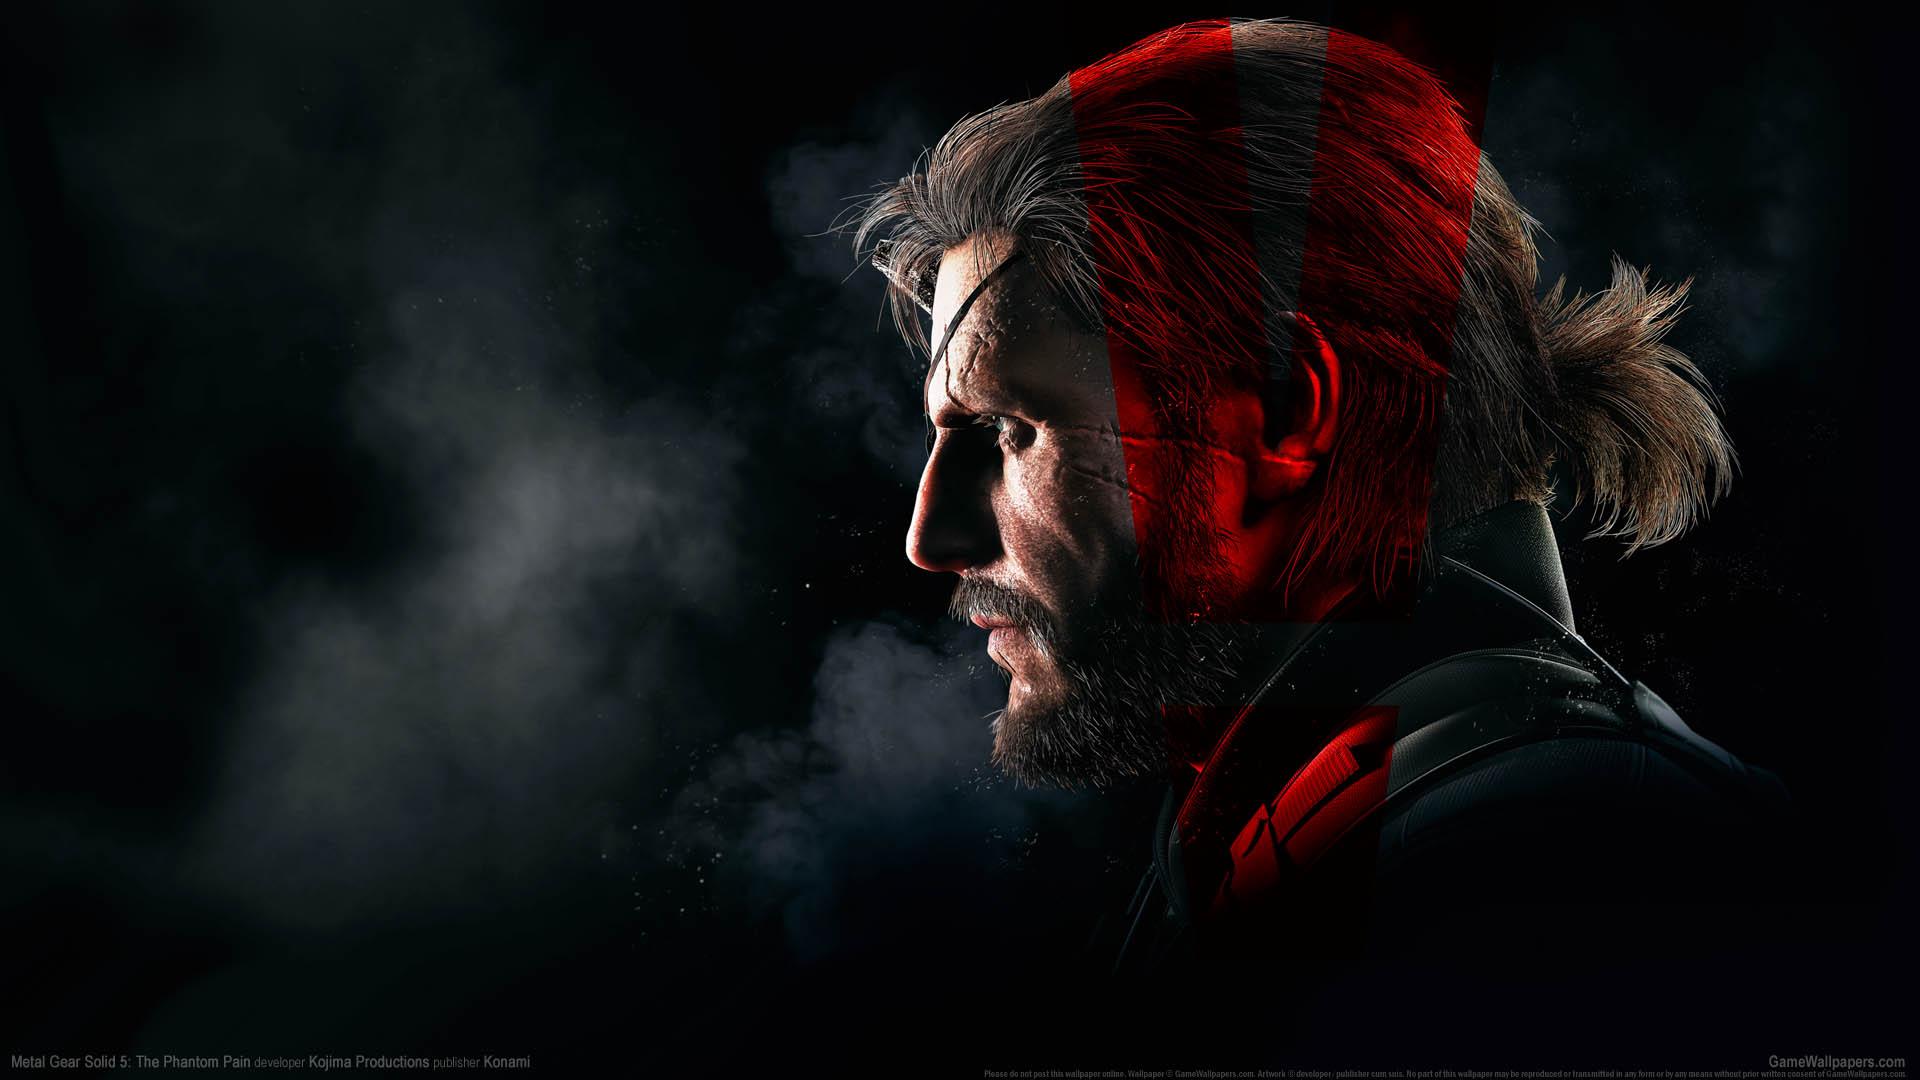 Metal Gear Solid 5 The Phantom Pain Wallpaper 01 1920x1080